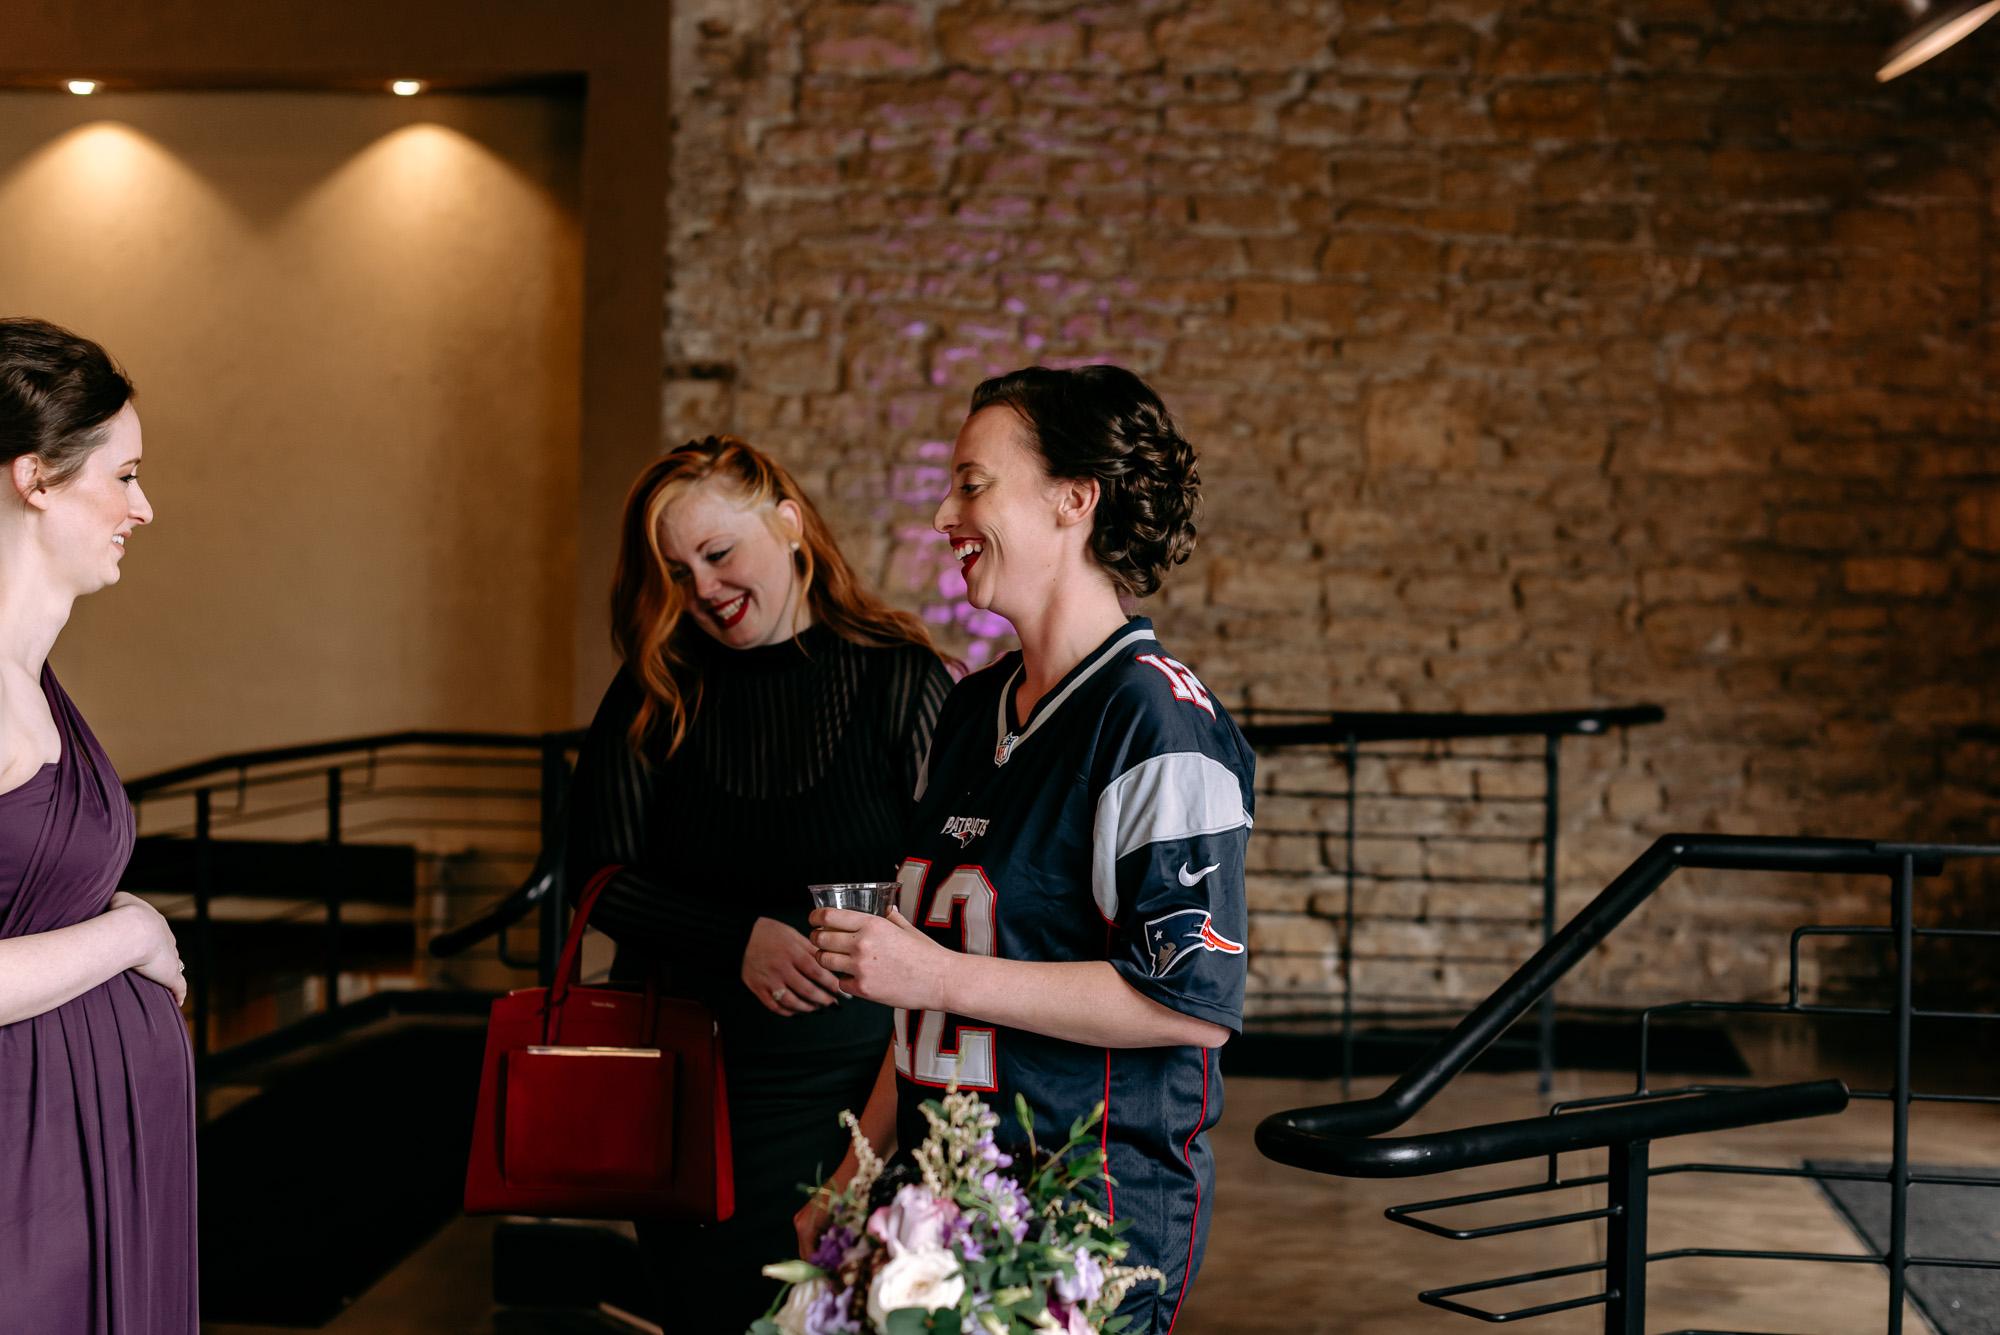 prairie-street-brewhouse-wedding-Rockford-IL-wedding-photographers-19.jpg